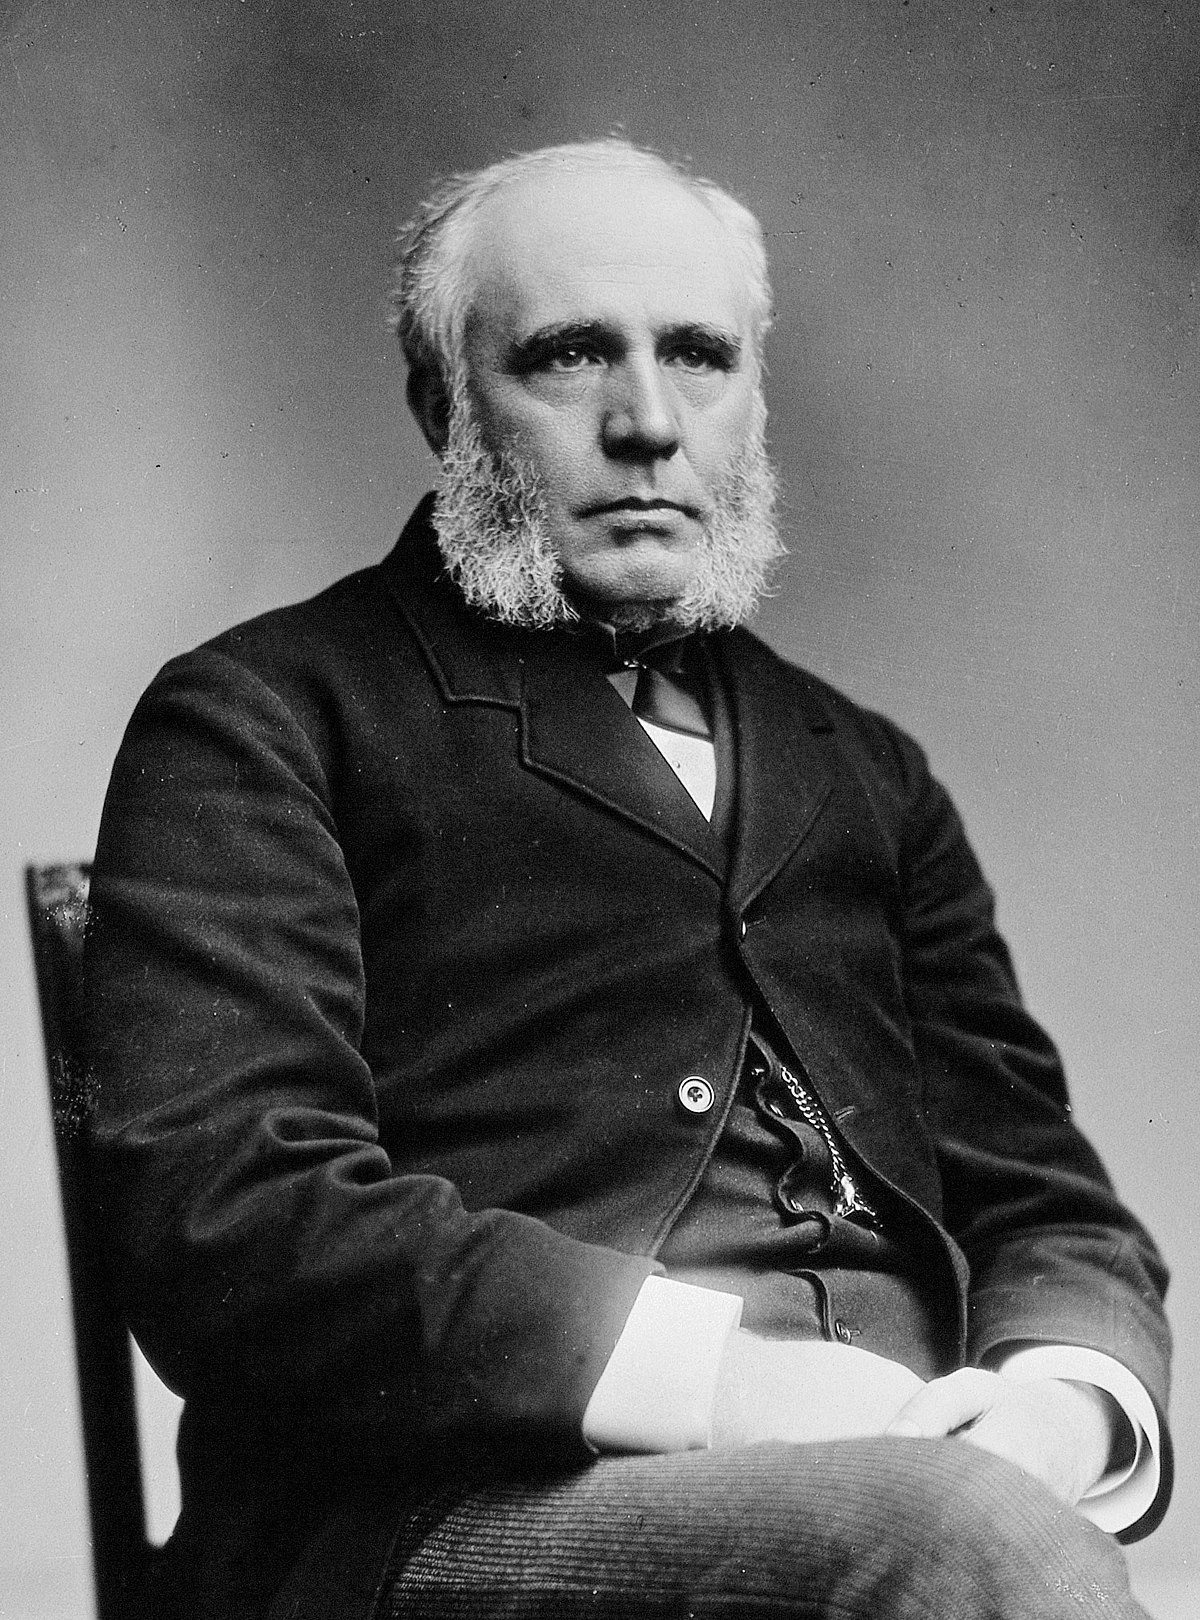 Physicians And Surgeons >> James Finlayson (surgeon) - Wikipedia